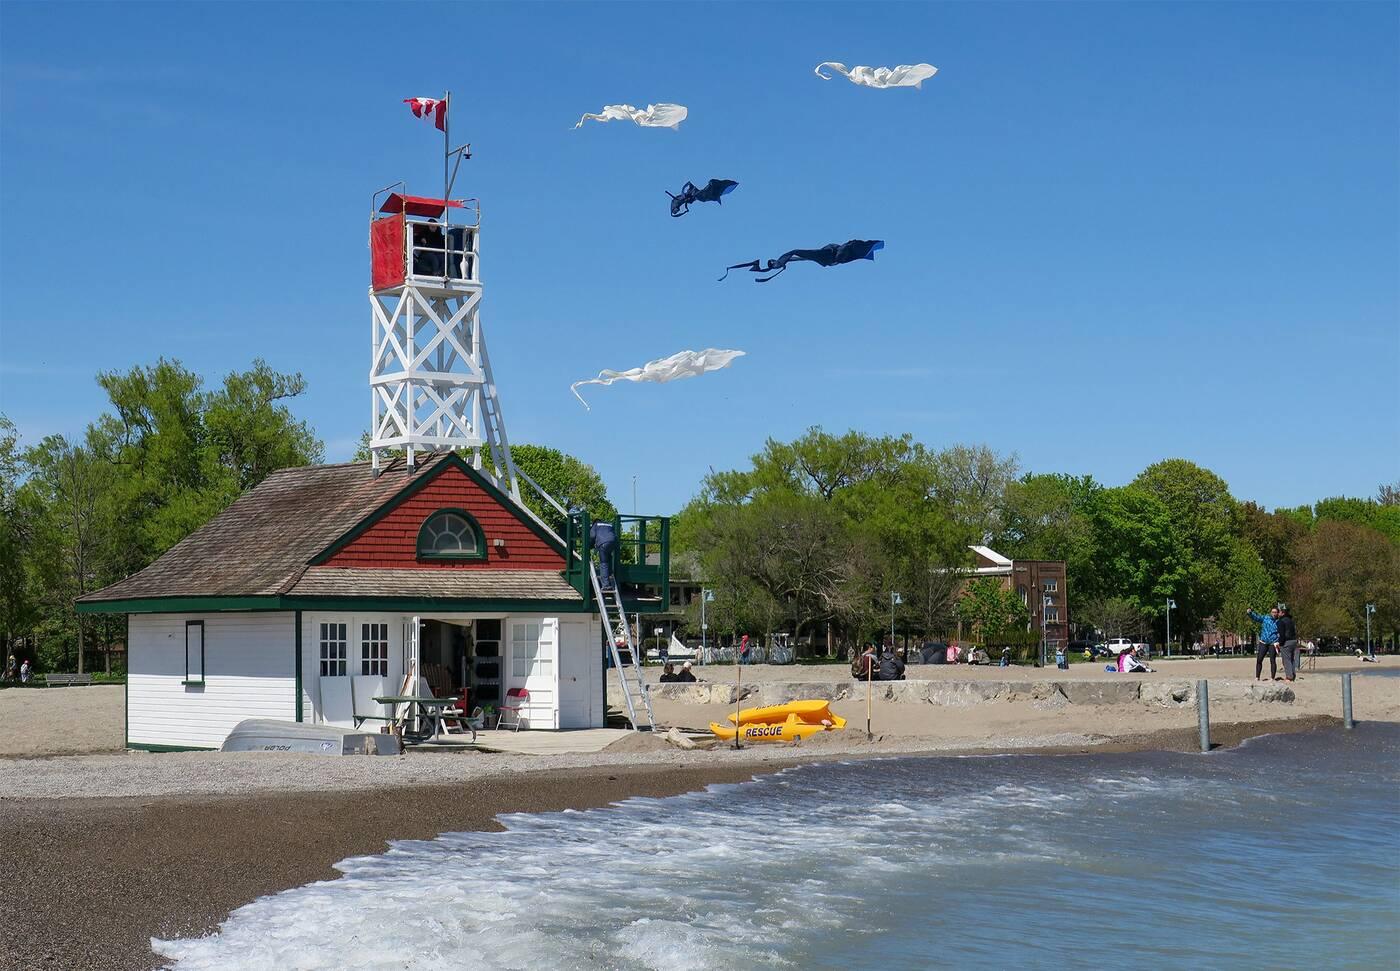 leauty lifeguard station